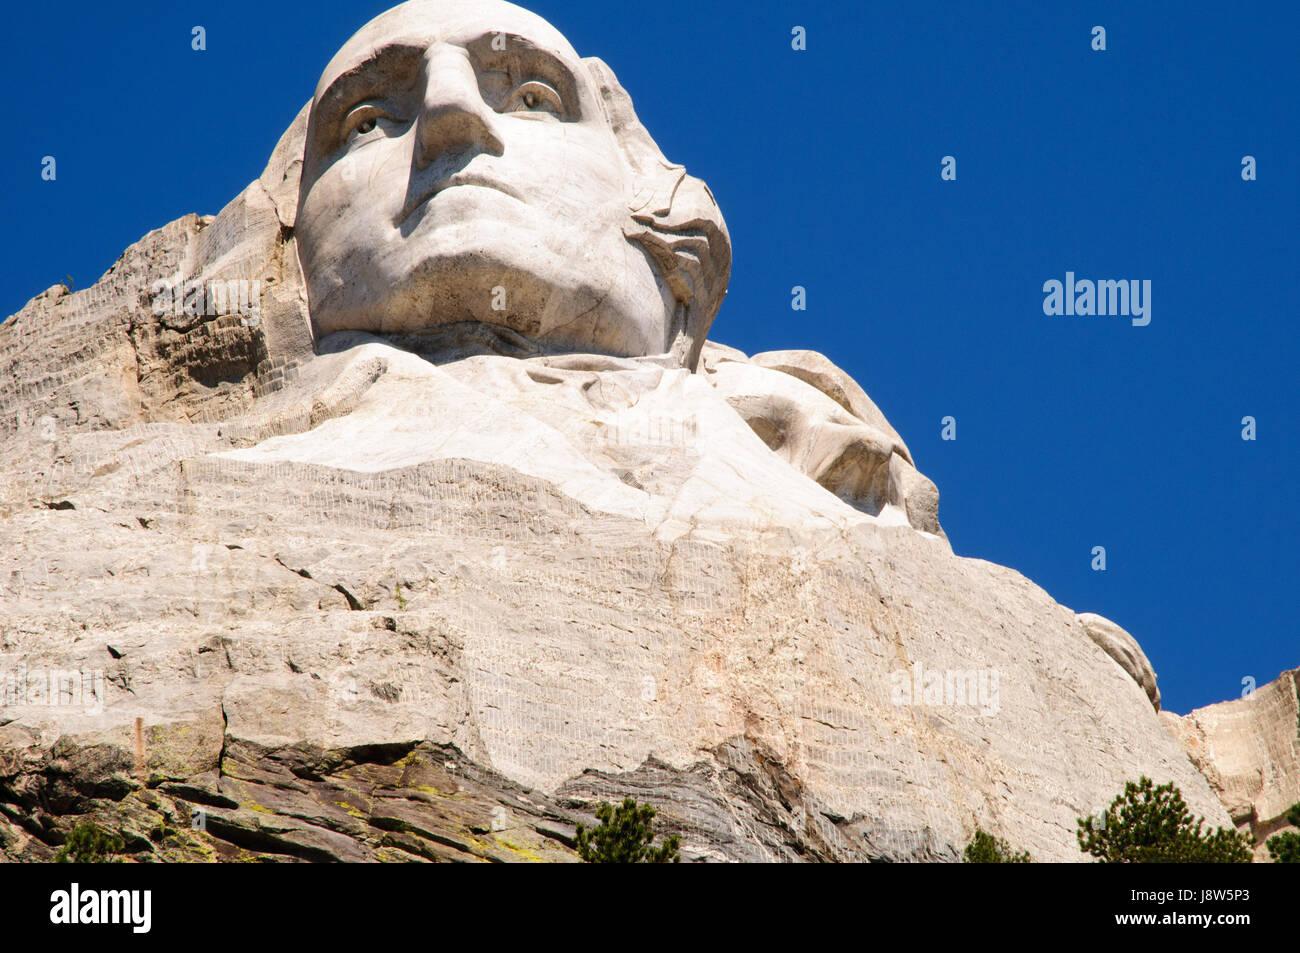 Mount Rushmore National Memorial, Black Hills, Keystone, South Dakota, USA - Stock Image